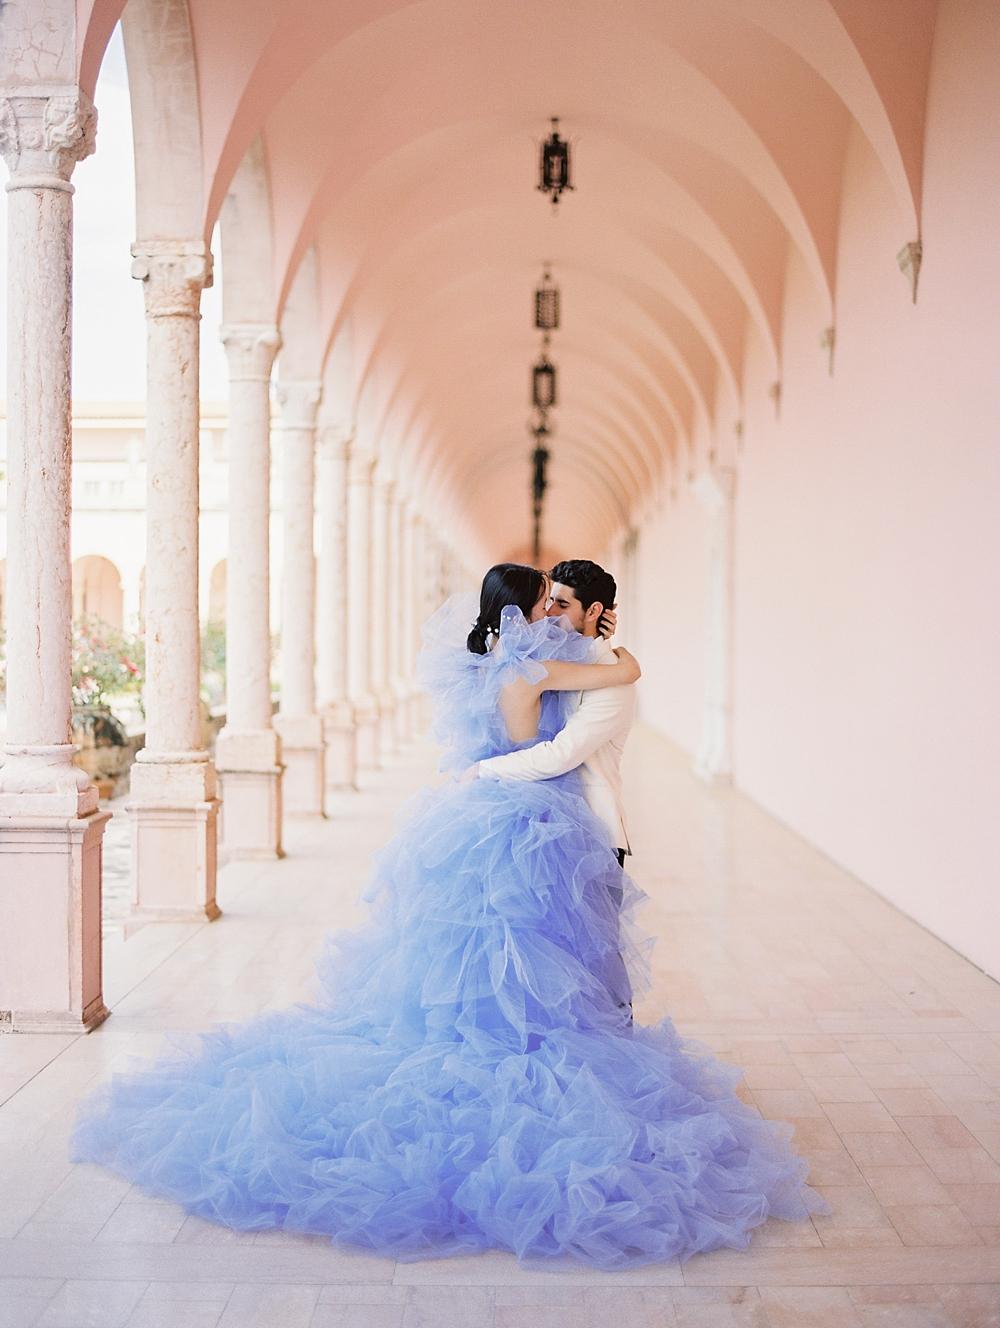 ringing sarasota wedding photographer